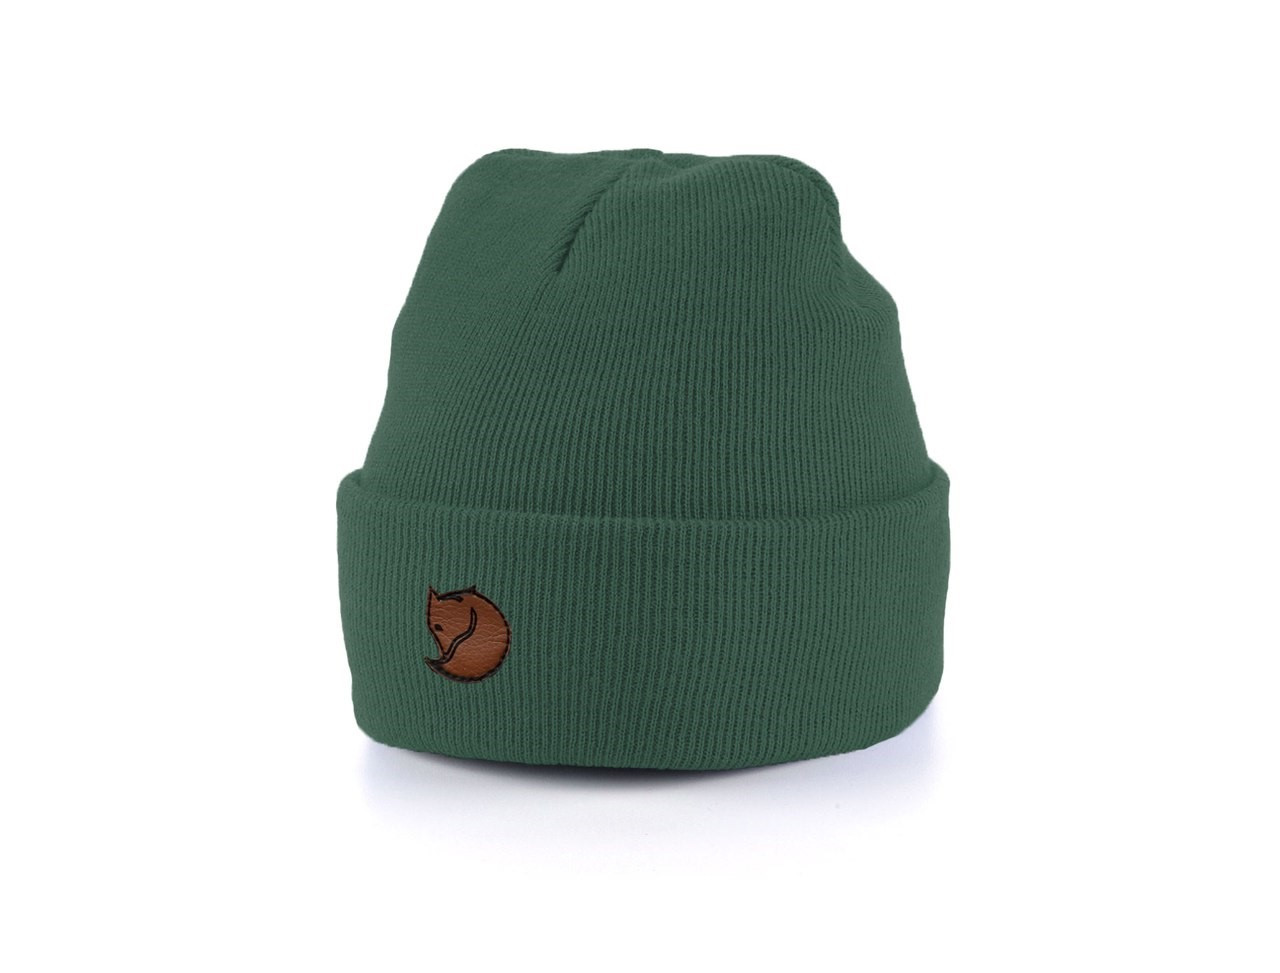 Мужская теплая шапка Fjallraven универсальный размер